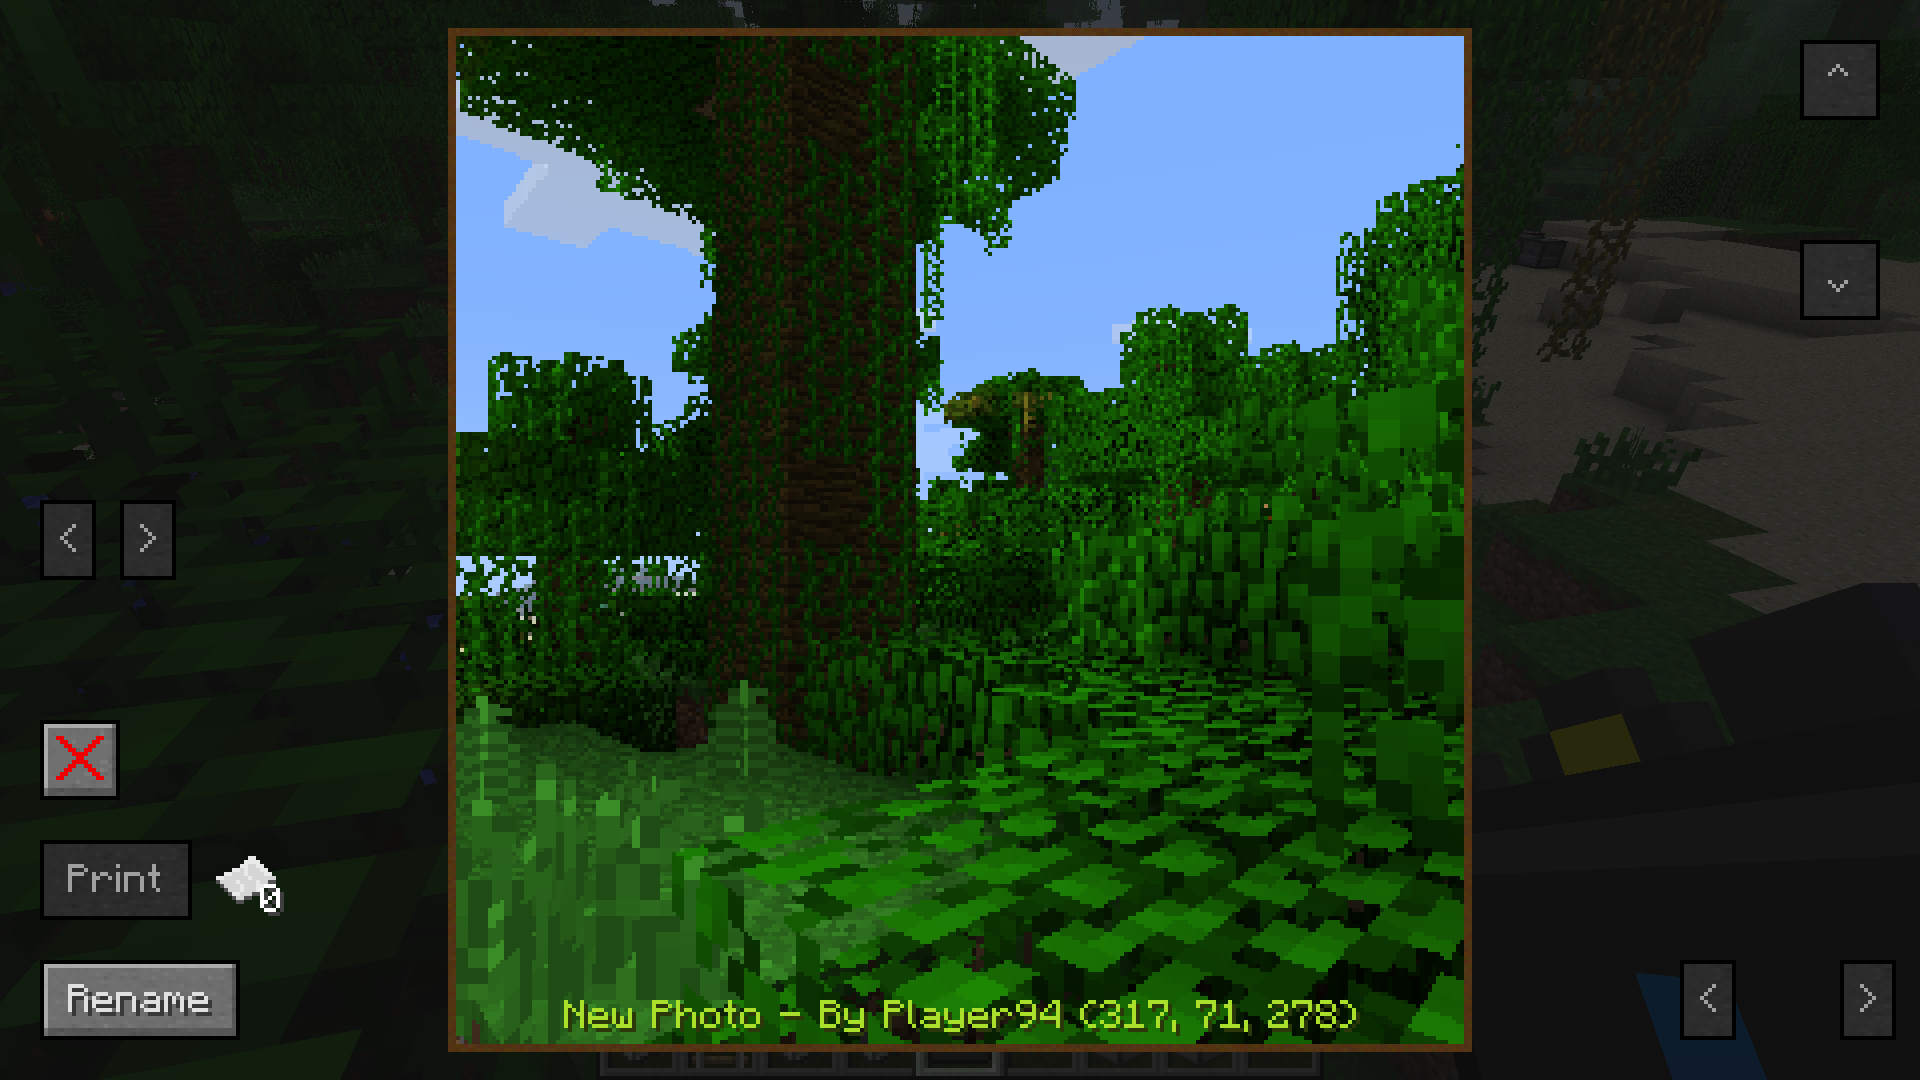 http://minecraft-forum.net/wp-content/uploads/2012/10/64c31__CameraCraft-Mod-5.png